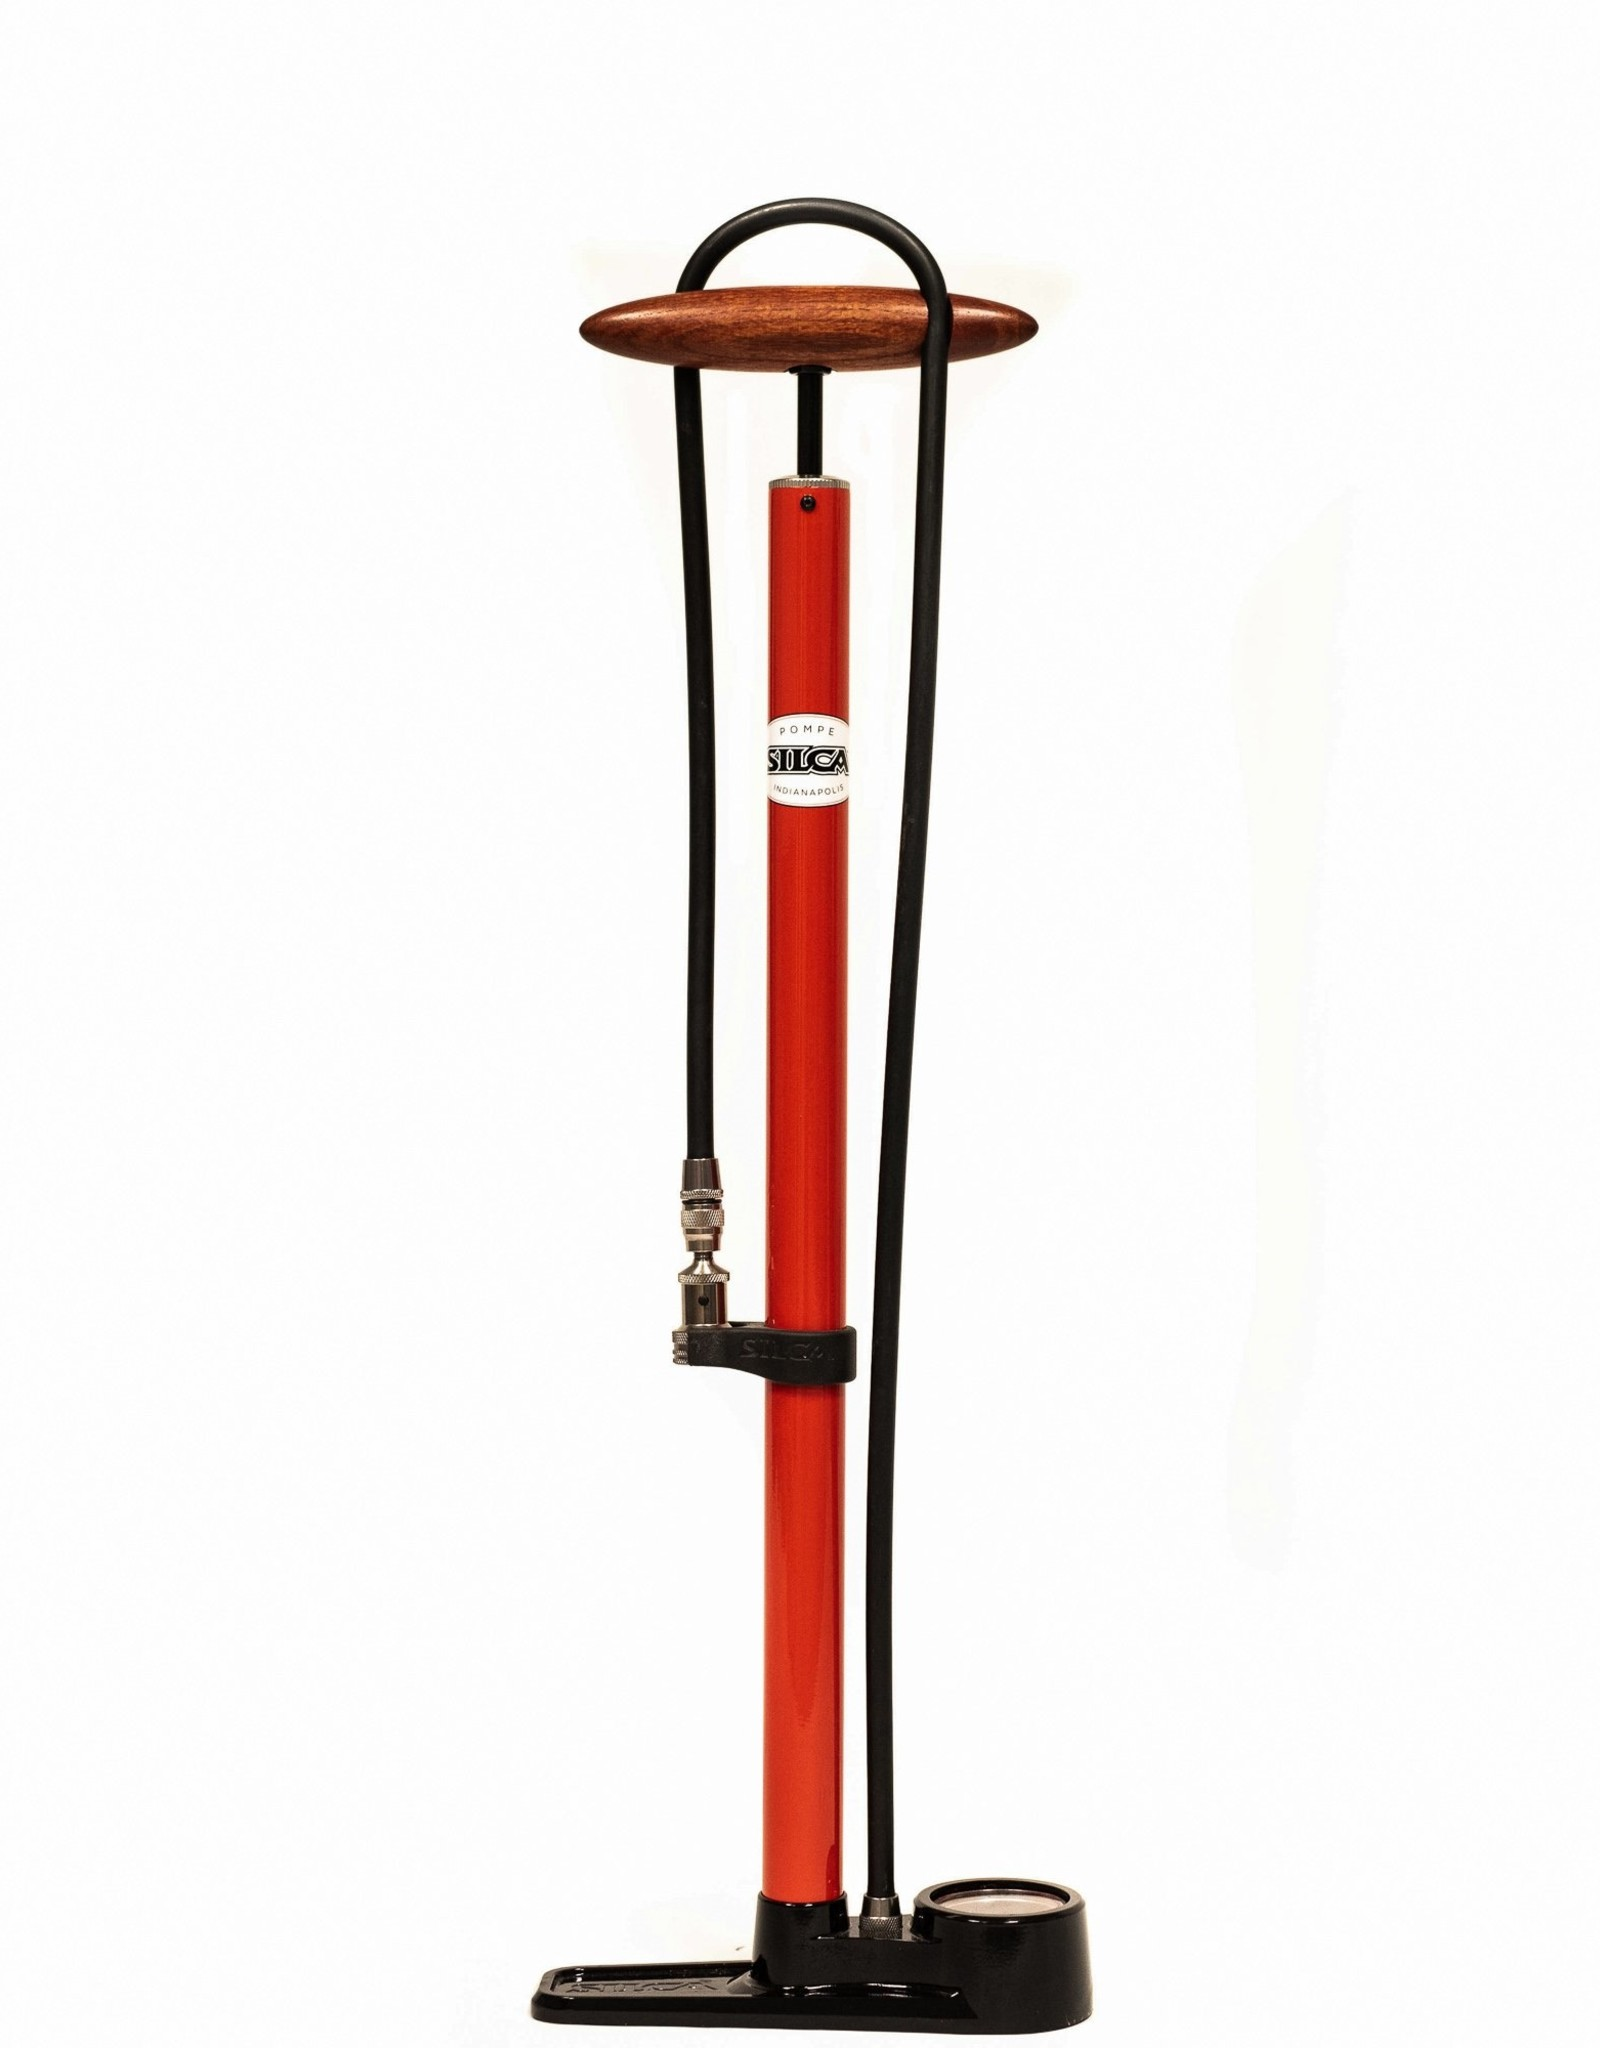 Silca Silca - Pista - Floor Pump